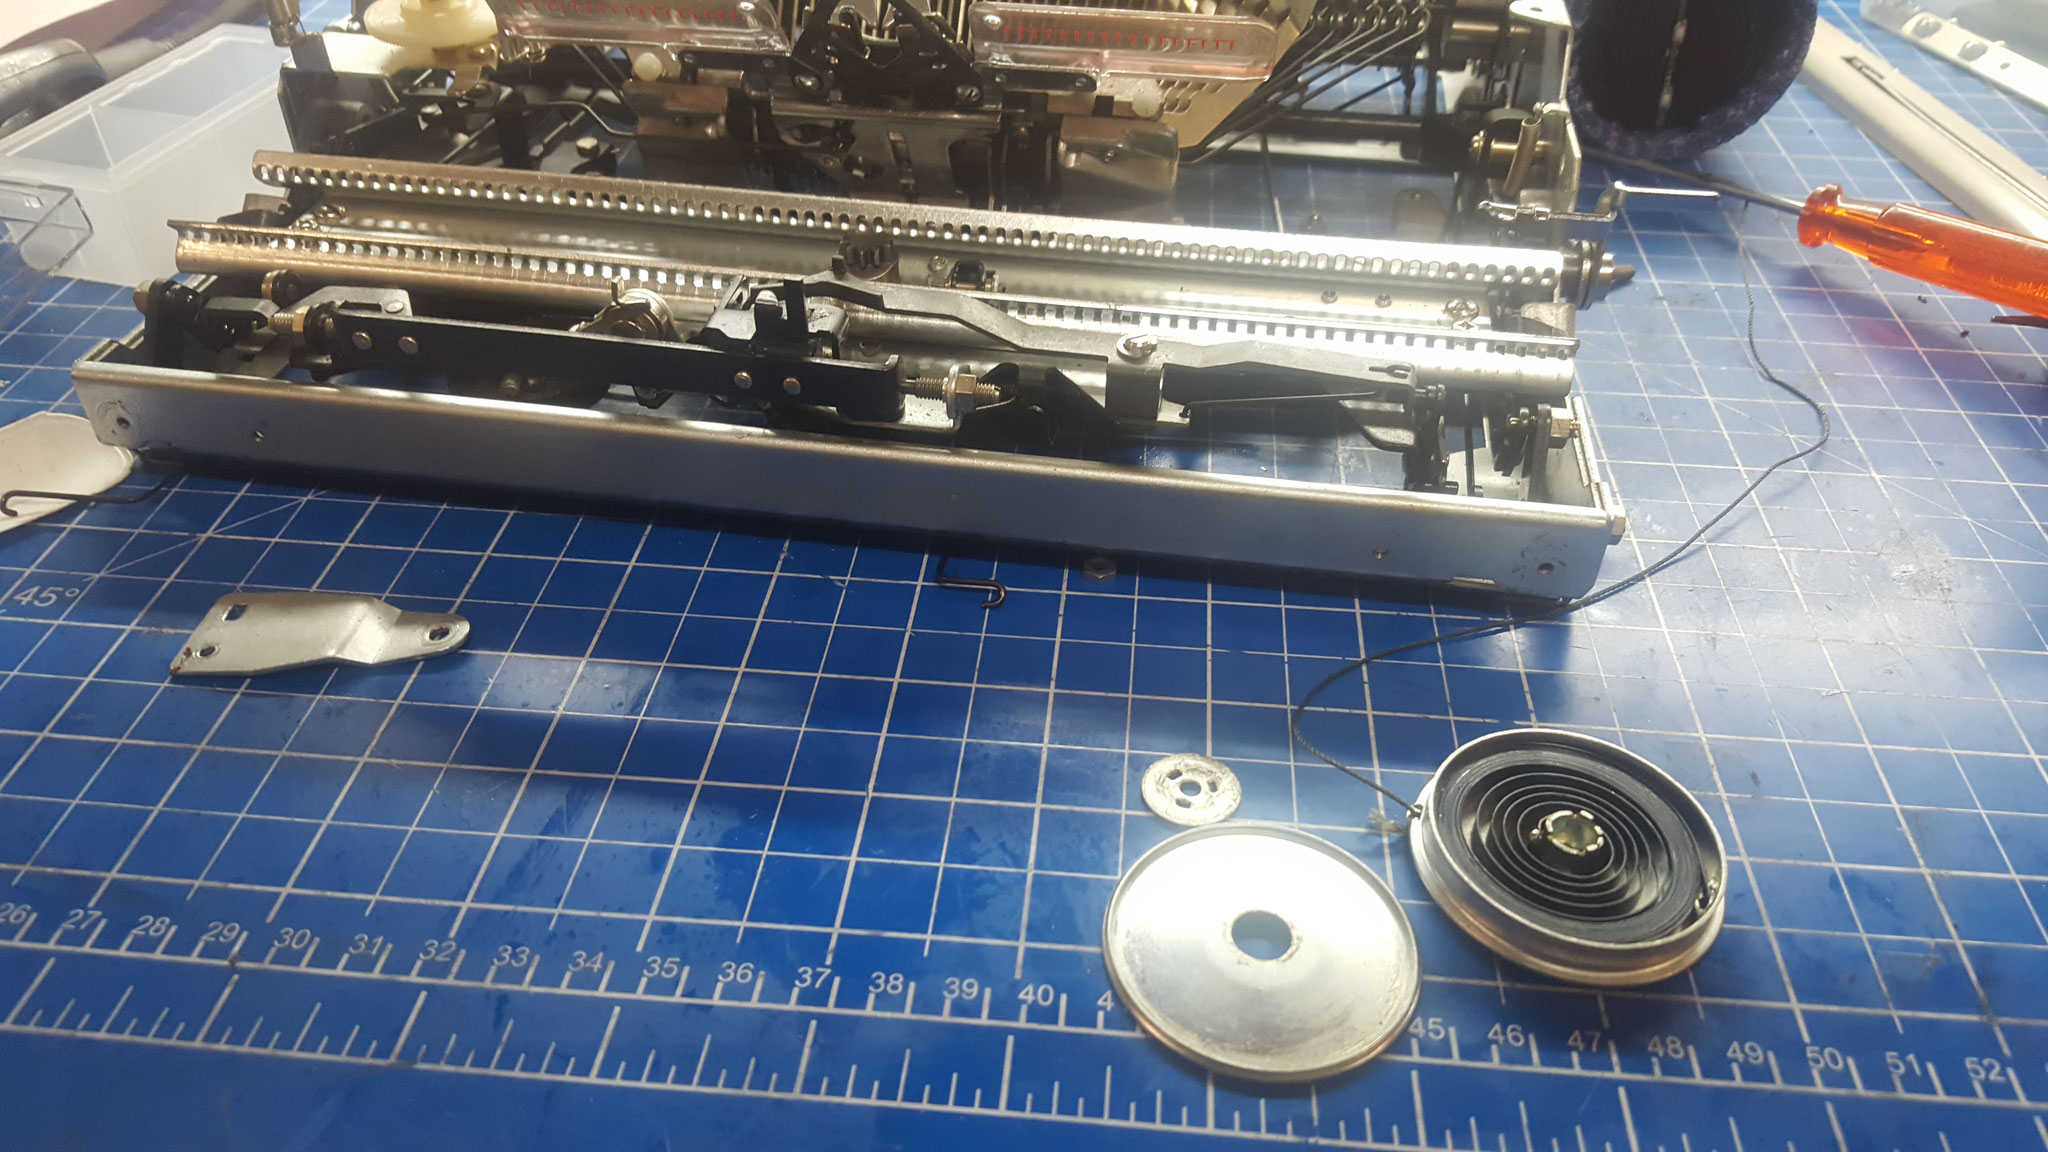 Wagenrückholspule an Schreibmaschine repariert